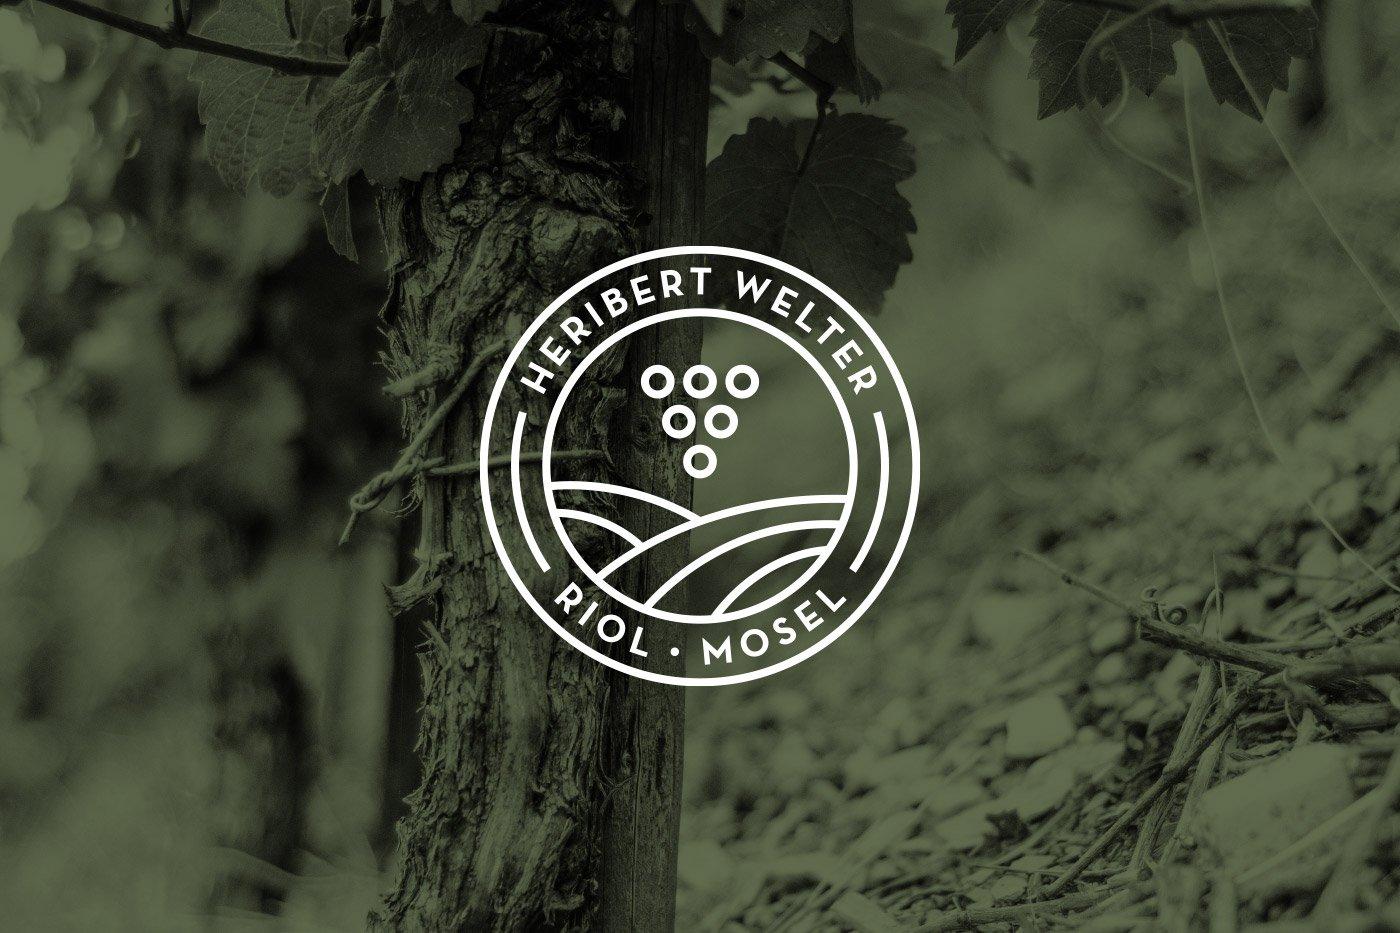 https://duktor.lu/wp-content/uploads/2019/08/duktor-projekt-weingut_johanneshof_21.jpg